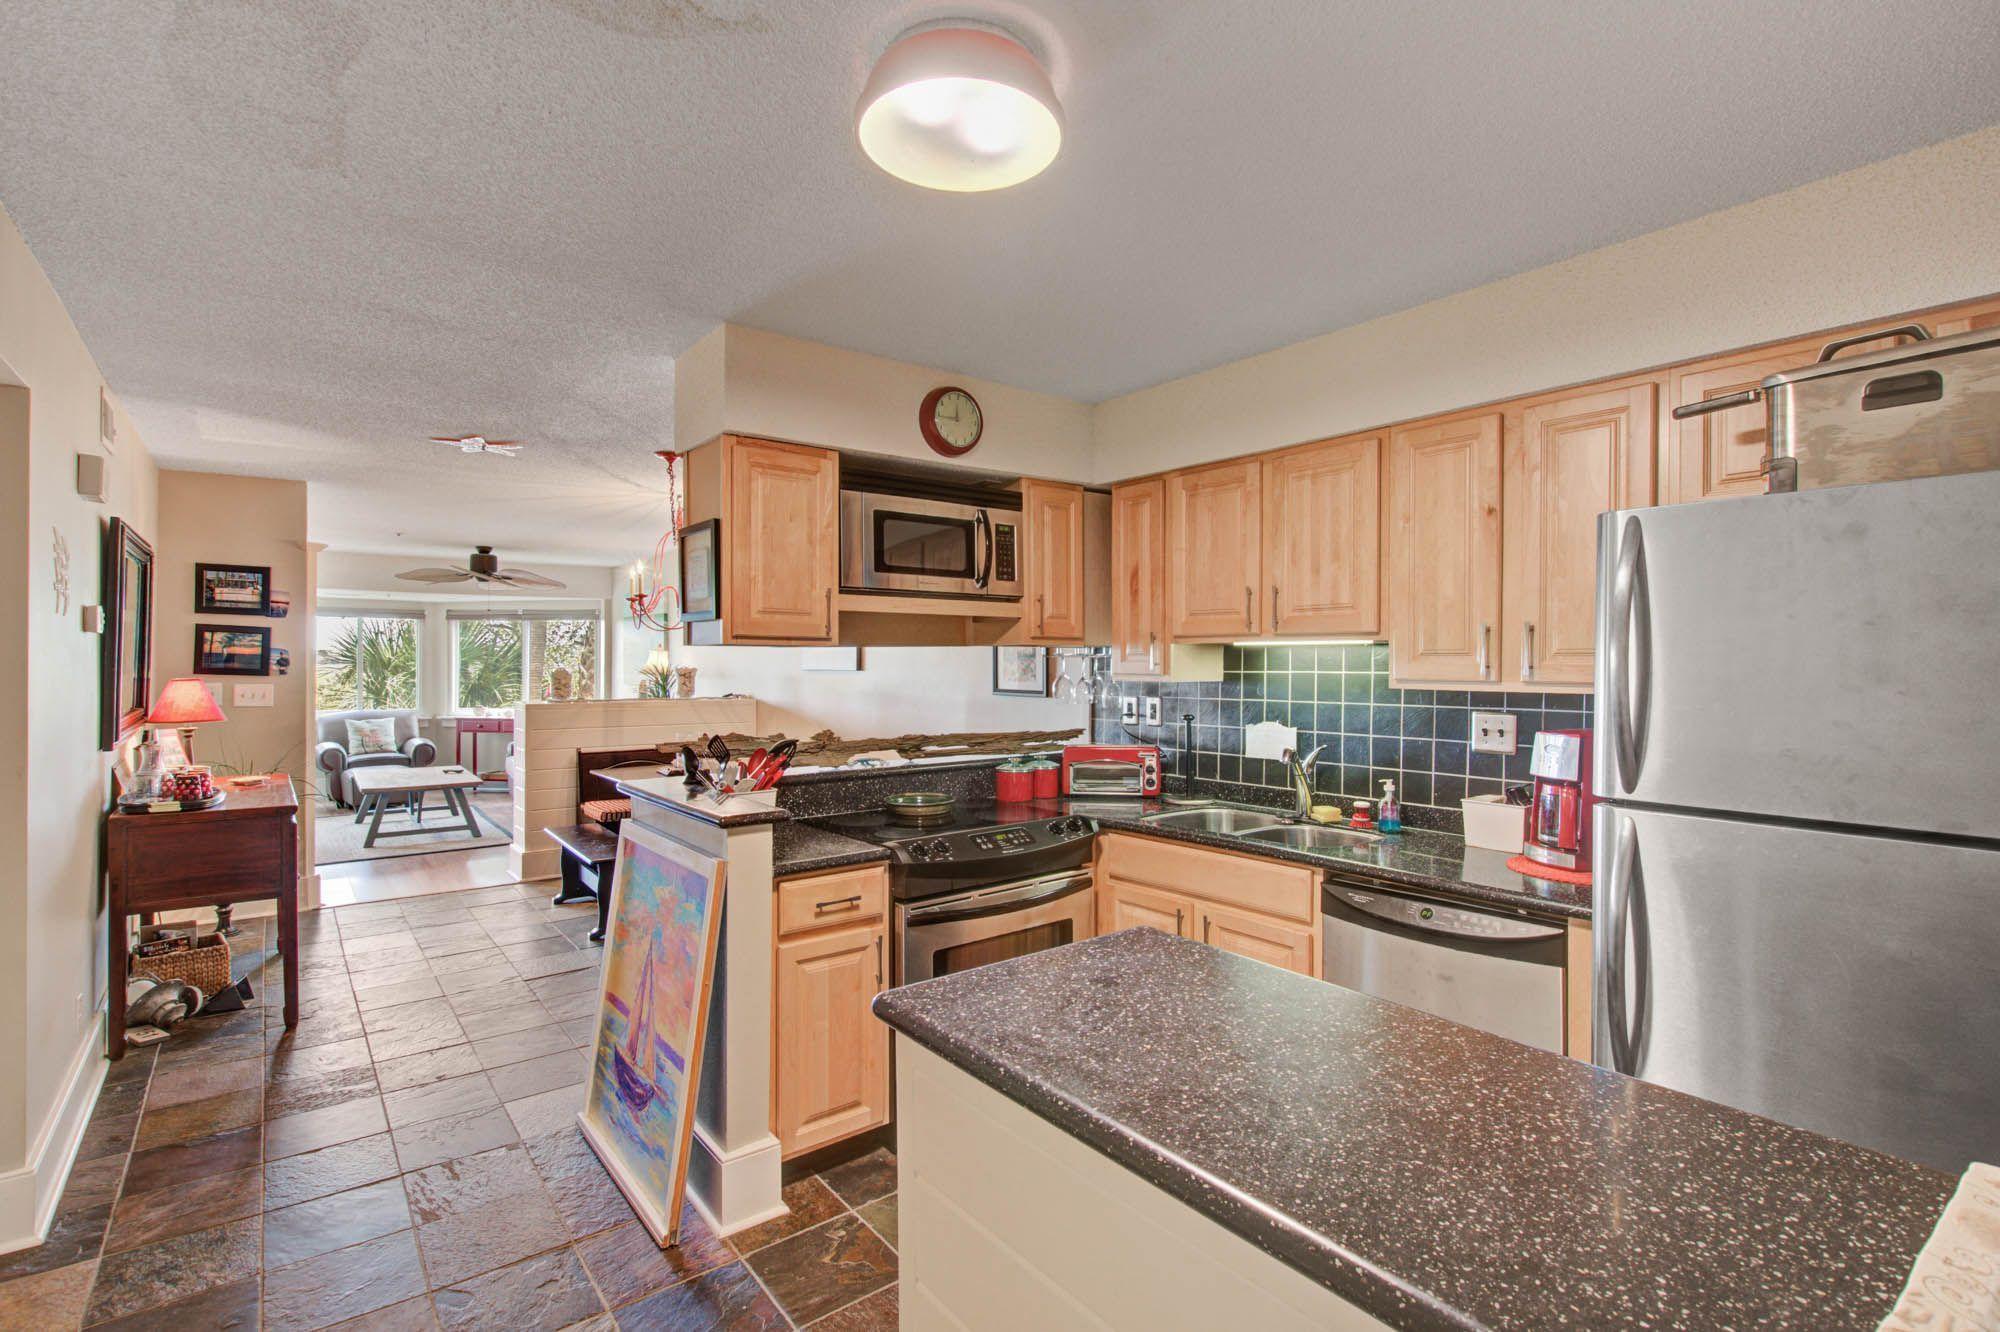 Marshview Villas Homes For Sale - 151 Marsh View Villas, Folly Beach, SC - 6